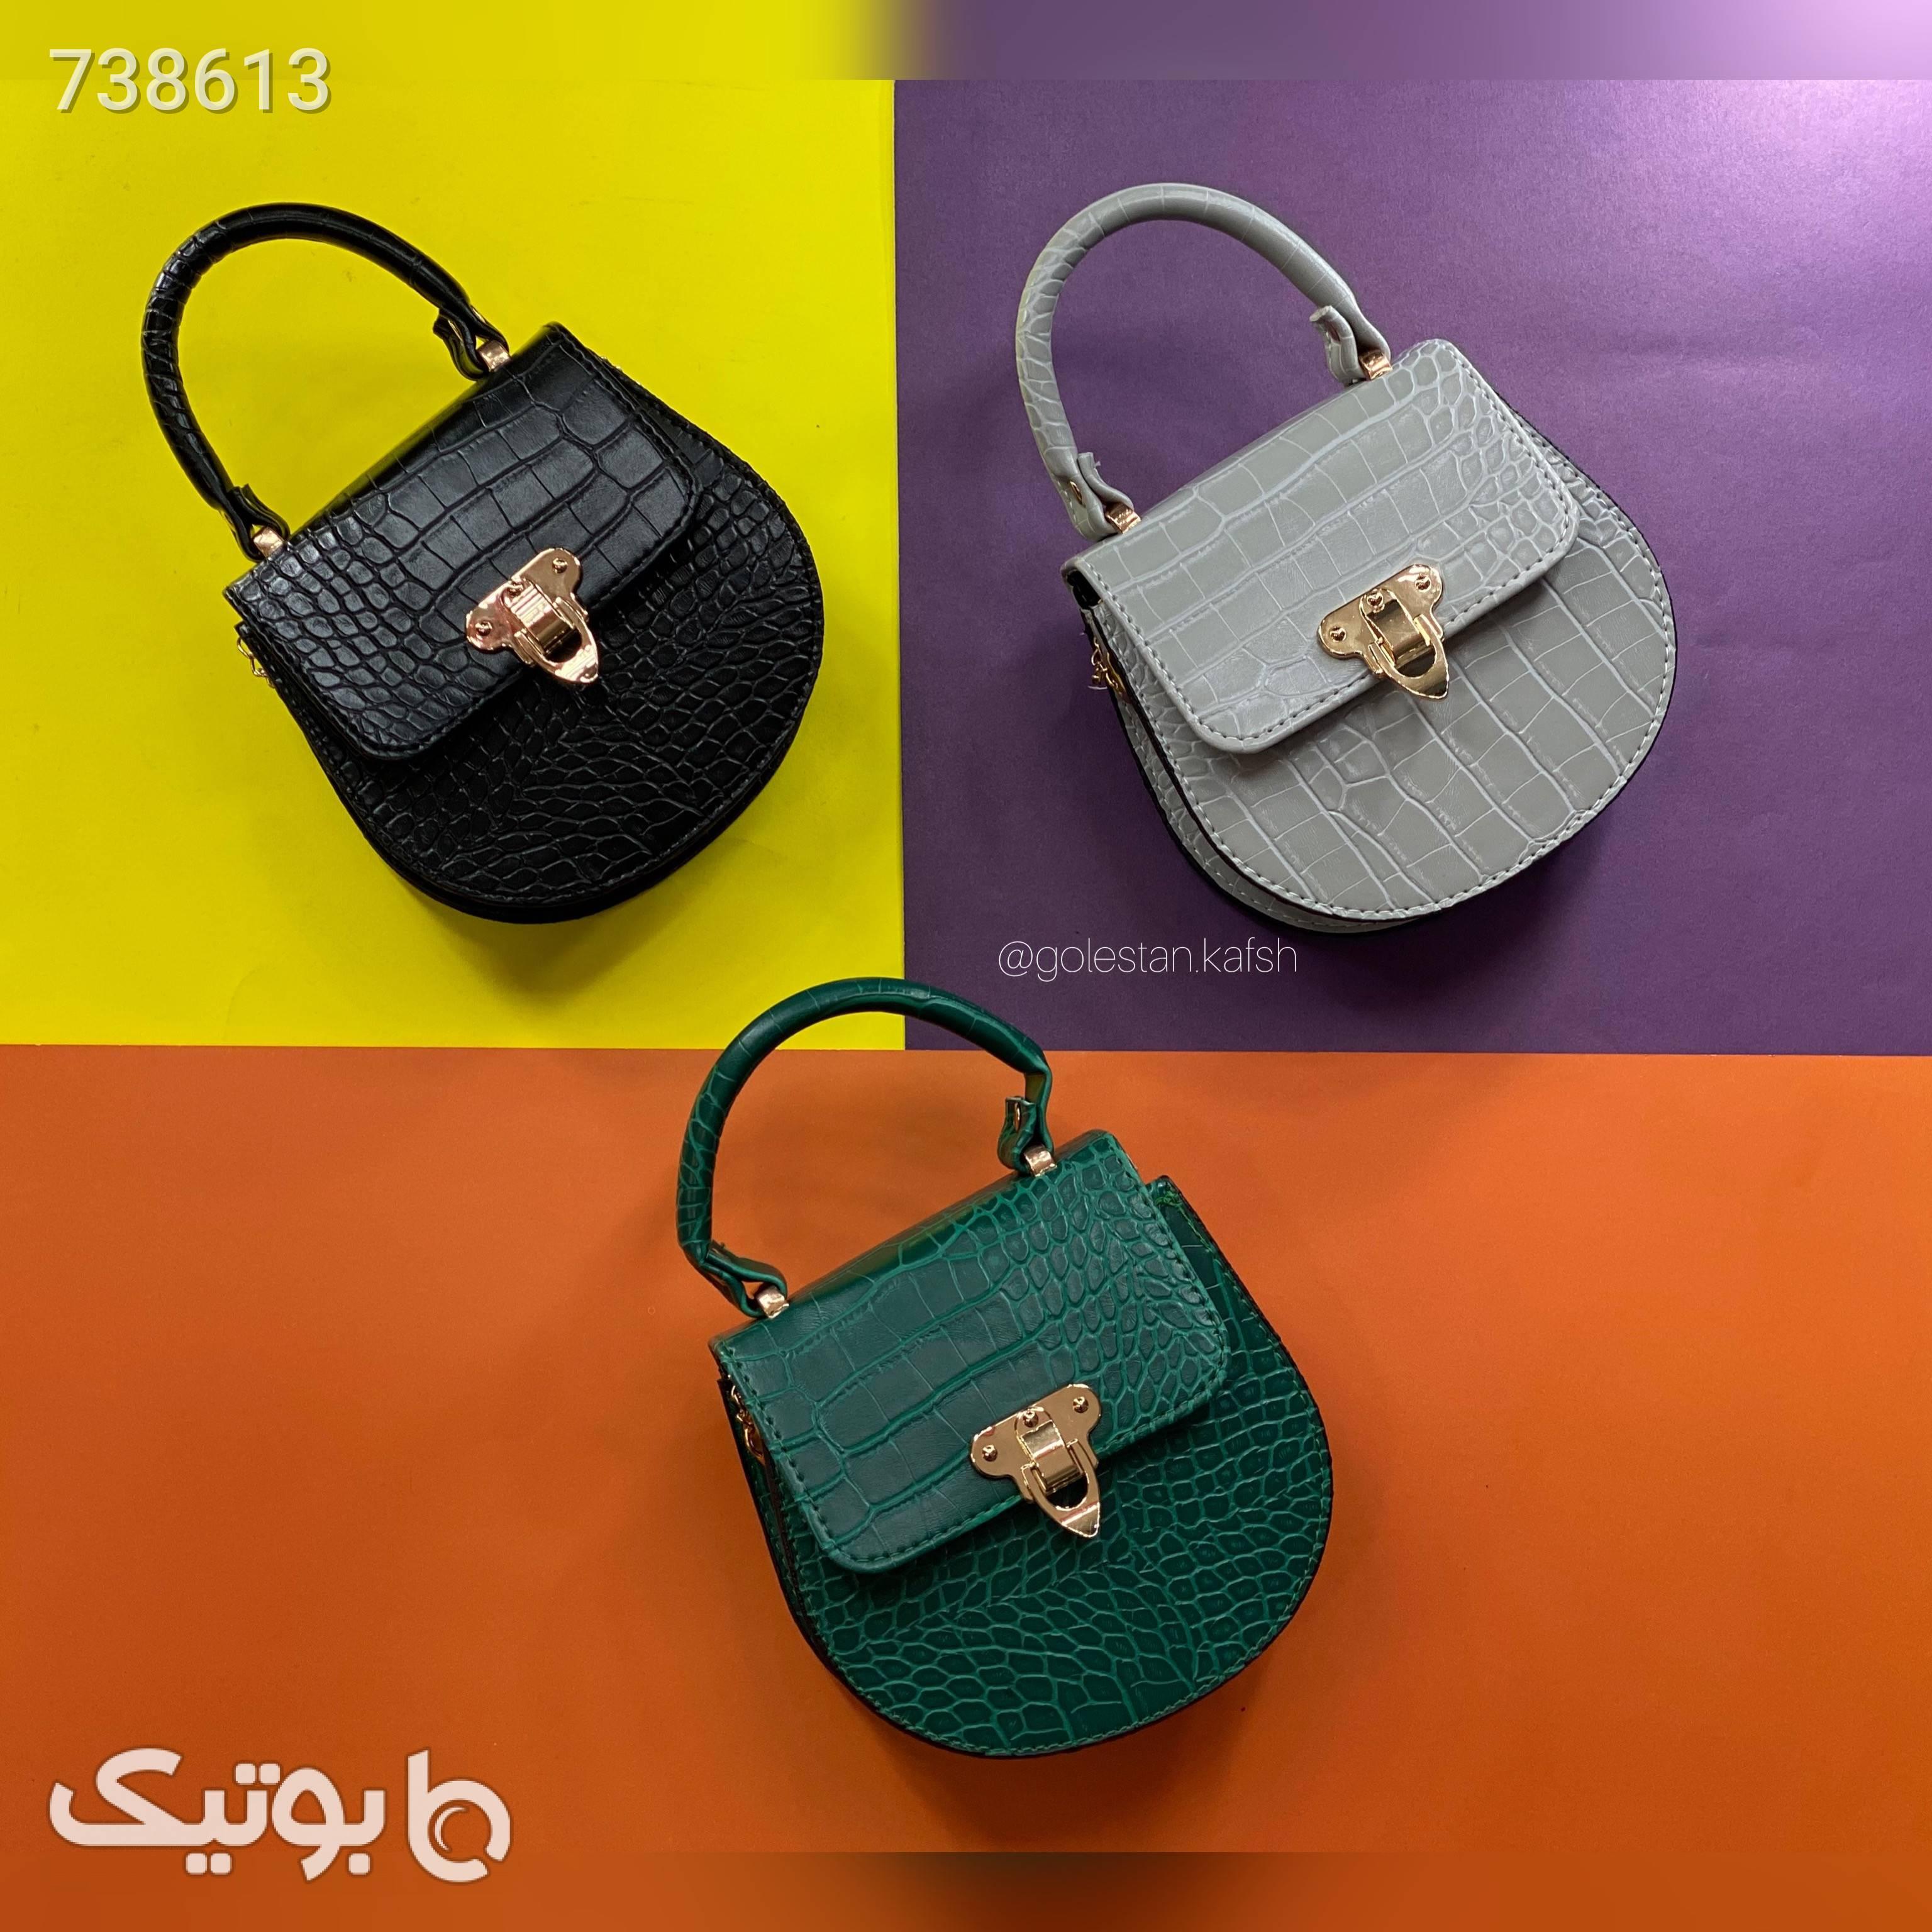 کیف  سبز كيف زنانه